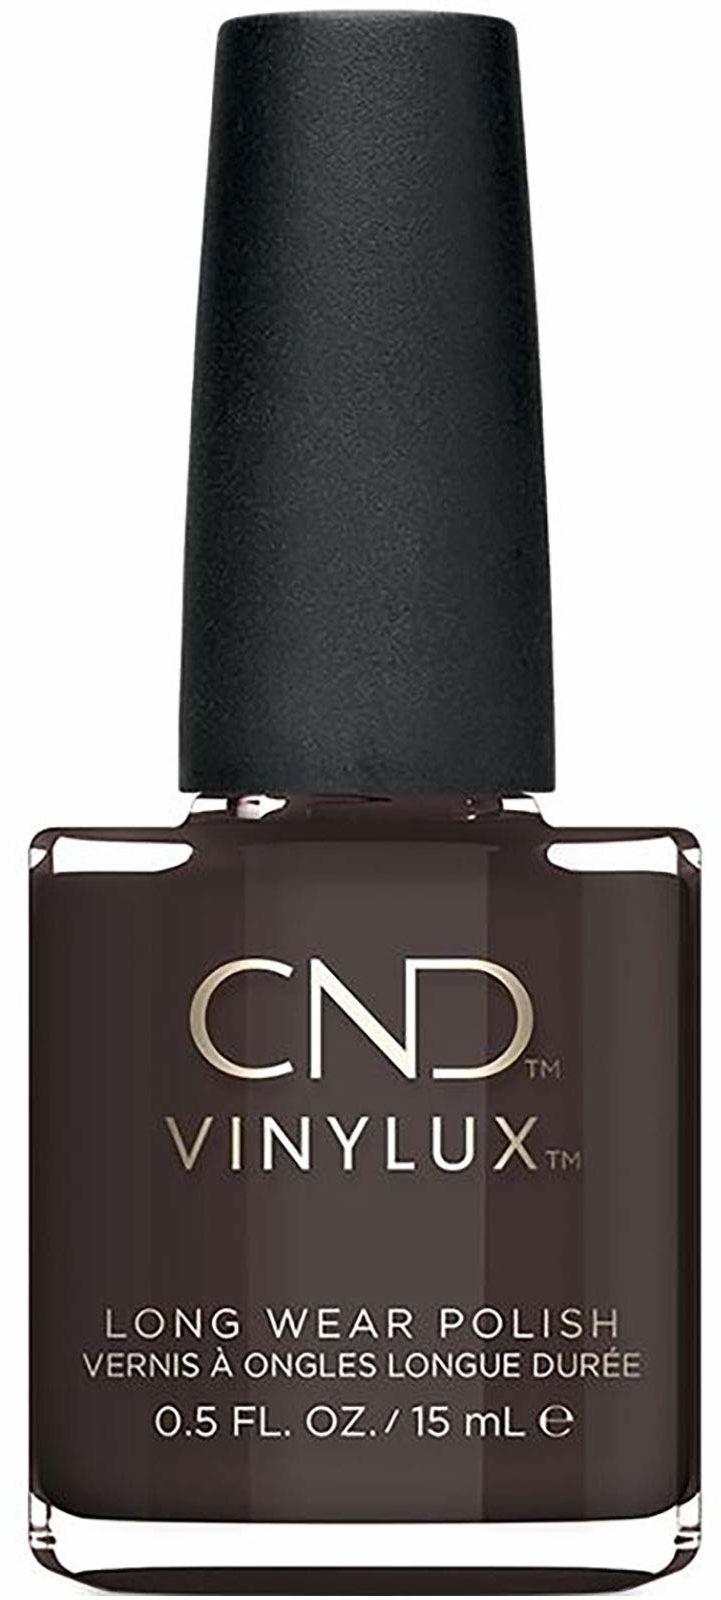 CND Vinylux Phantom nr 306, 15 ml